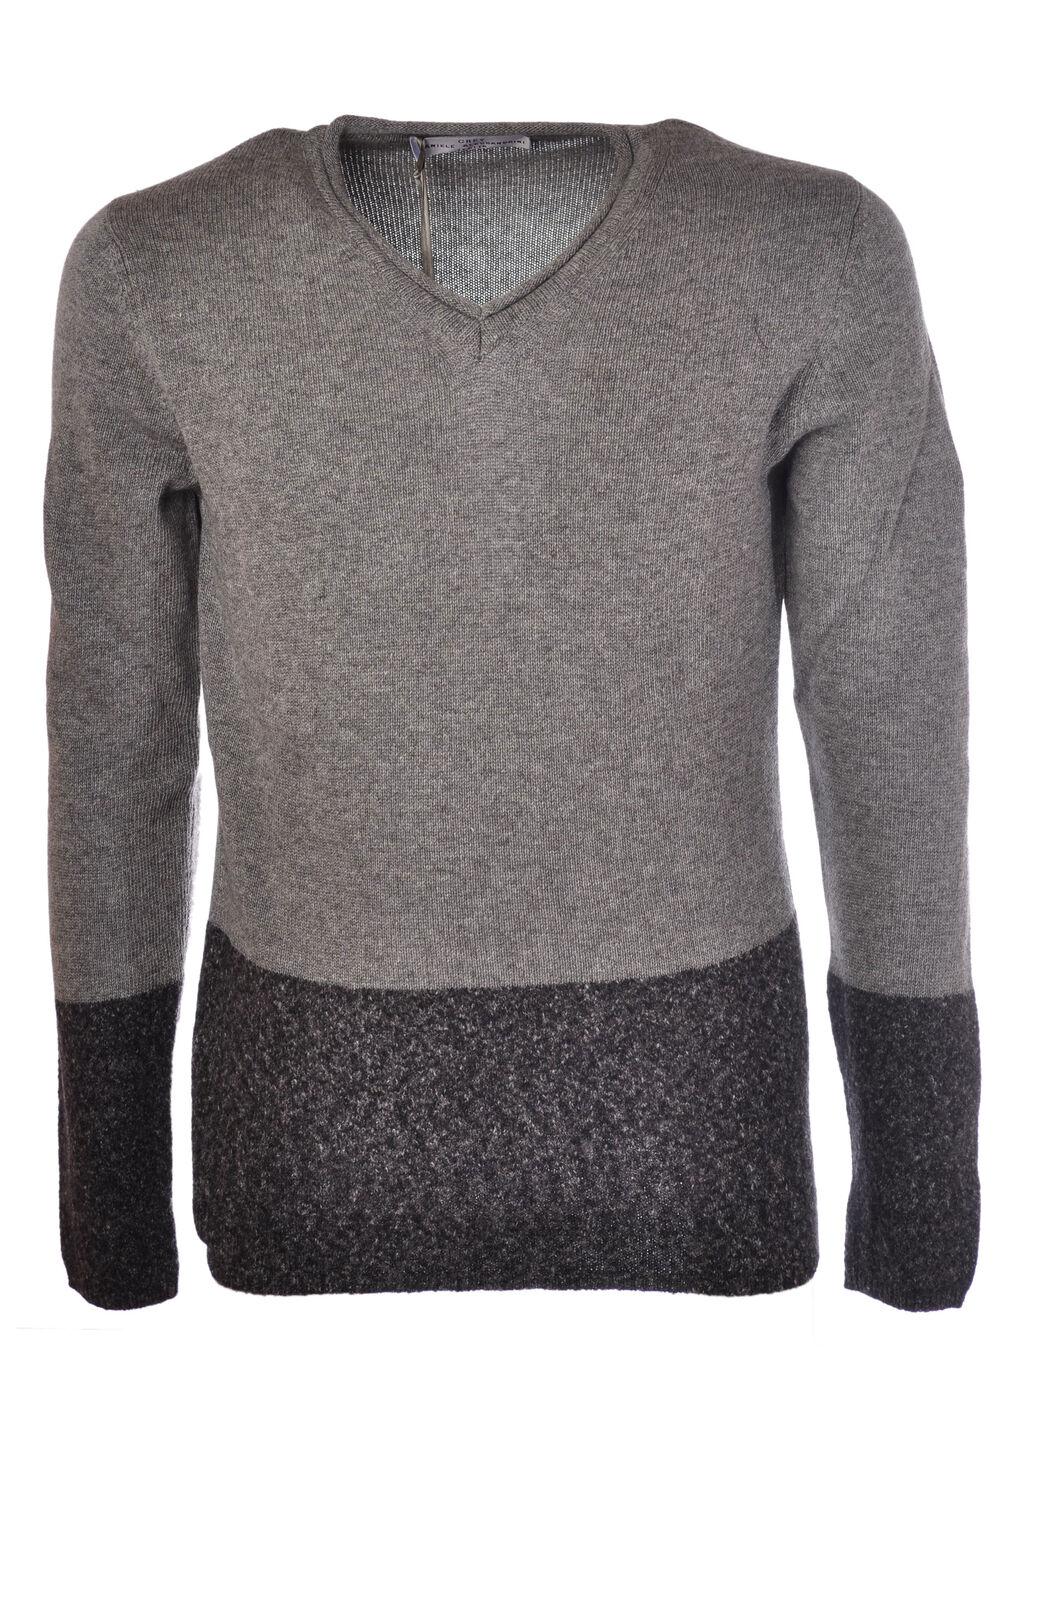 Daniele Alessandrini  -  Sweaters - Male - Grau - 2831531N173456